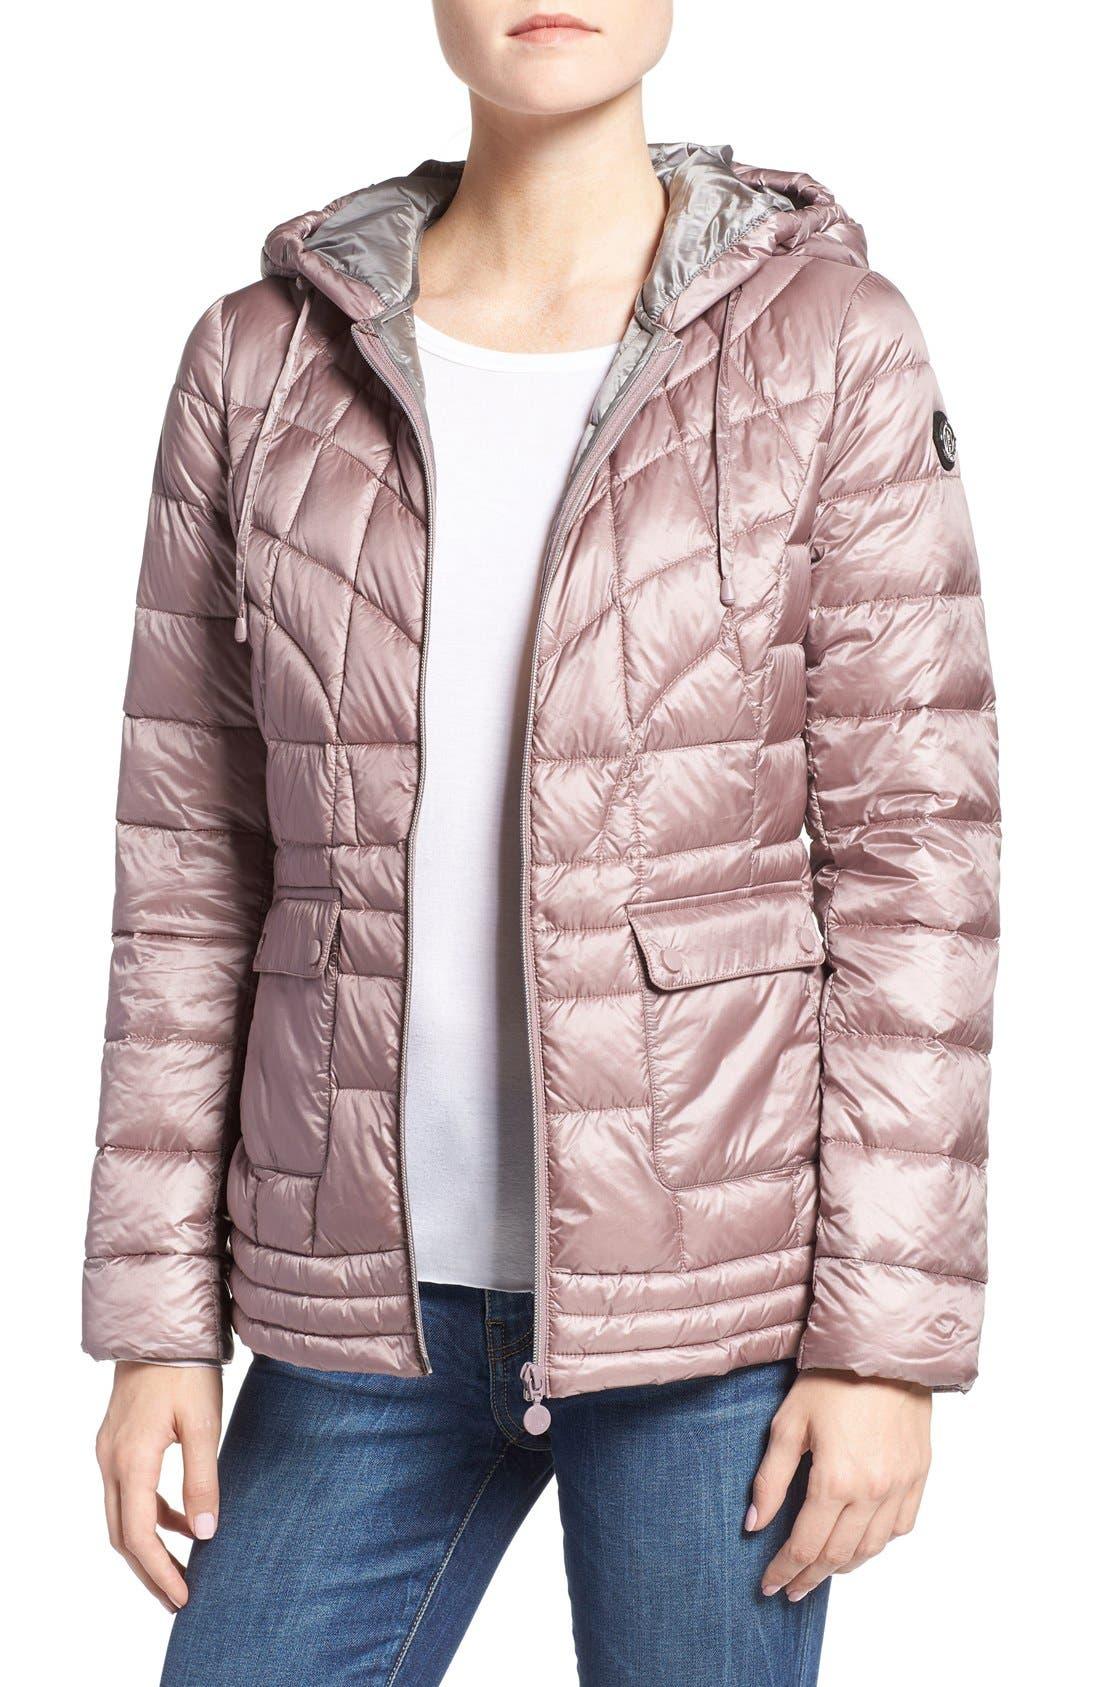 Alternate Image 1 Selected - Bernardo Packable Down & PrimaLoft® Fill Hooded Jacket (Regular & Petite)